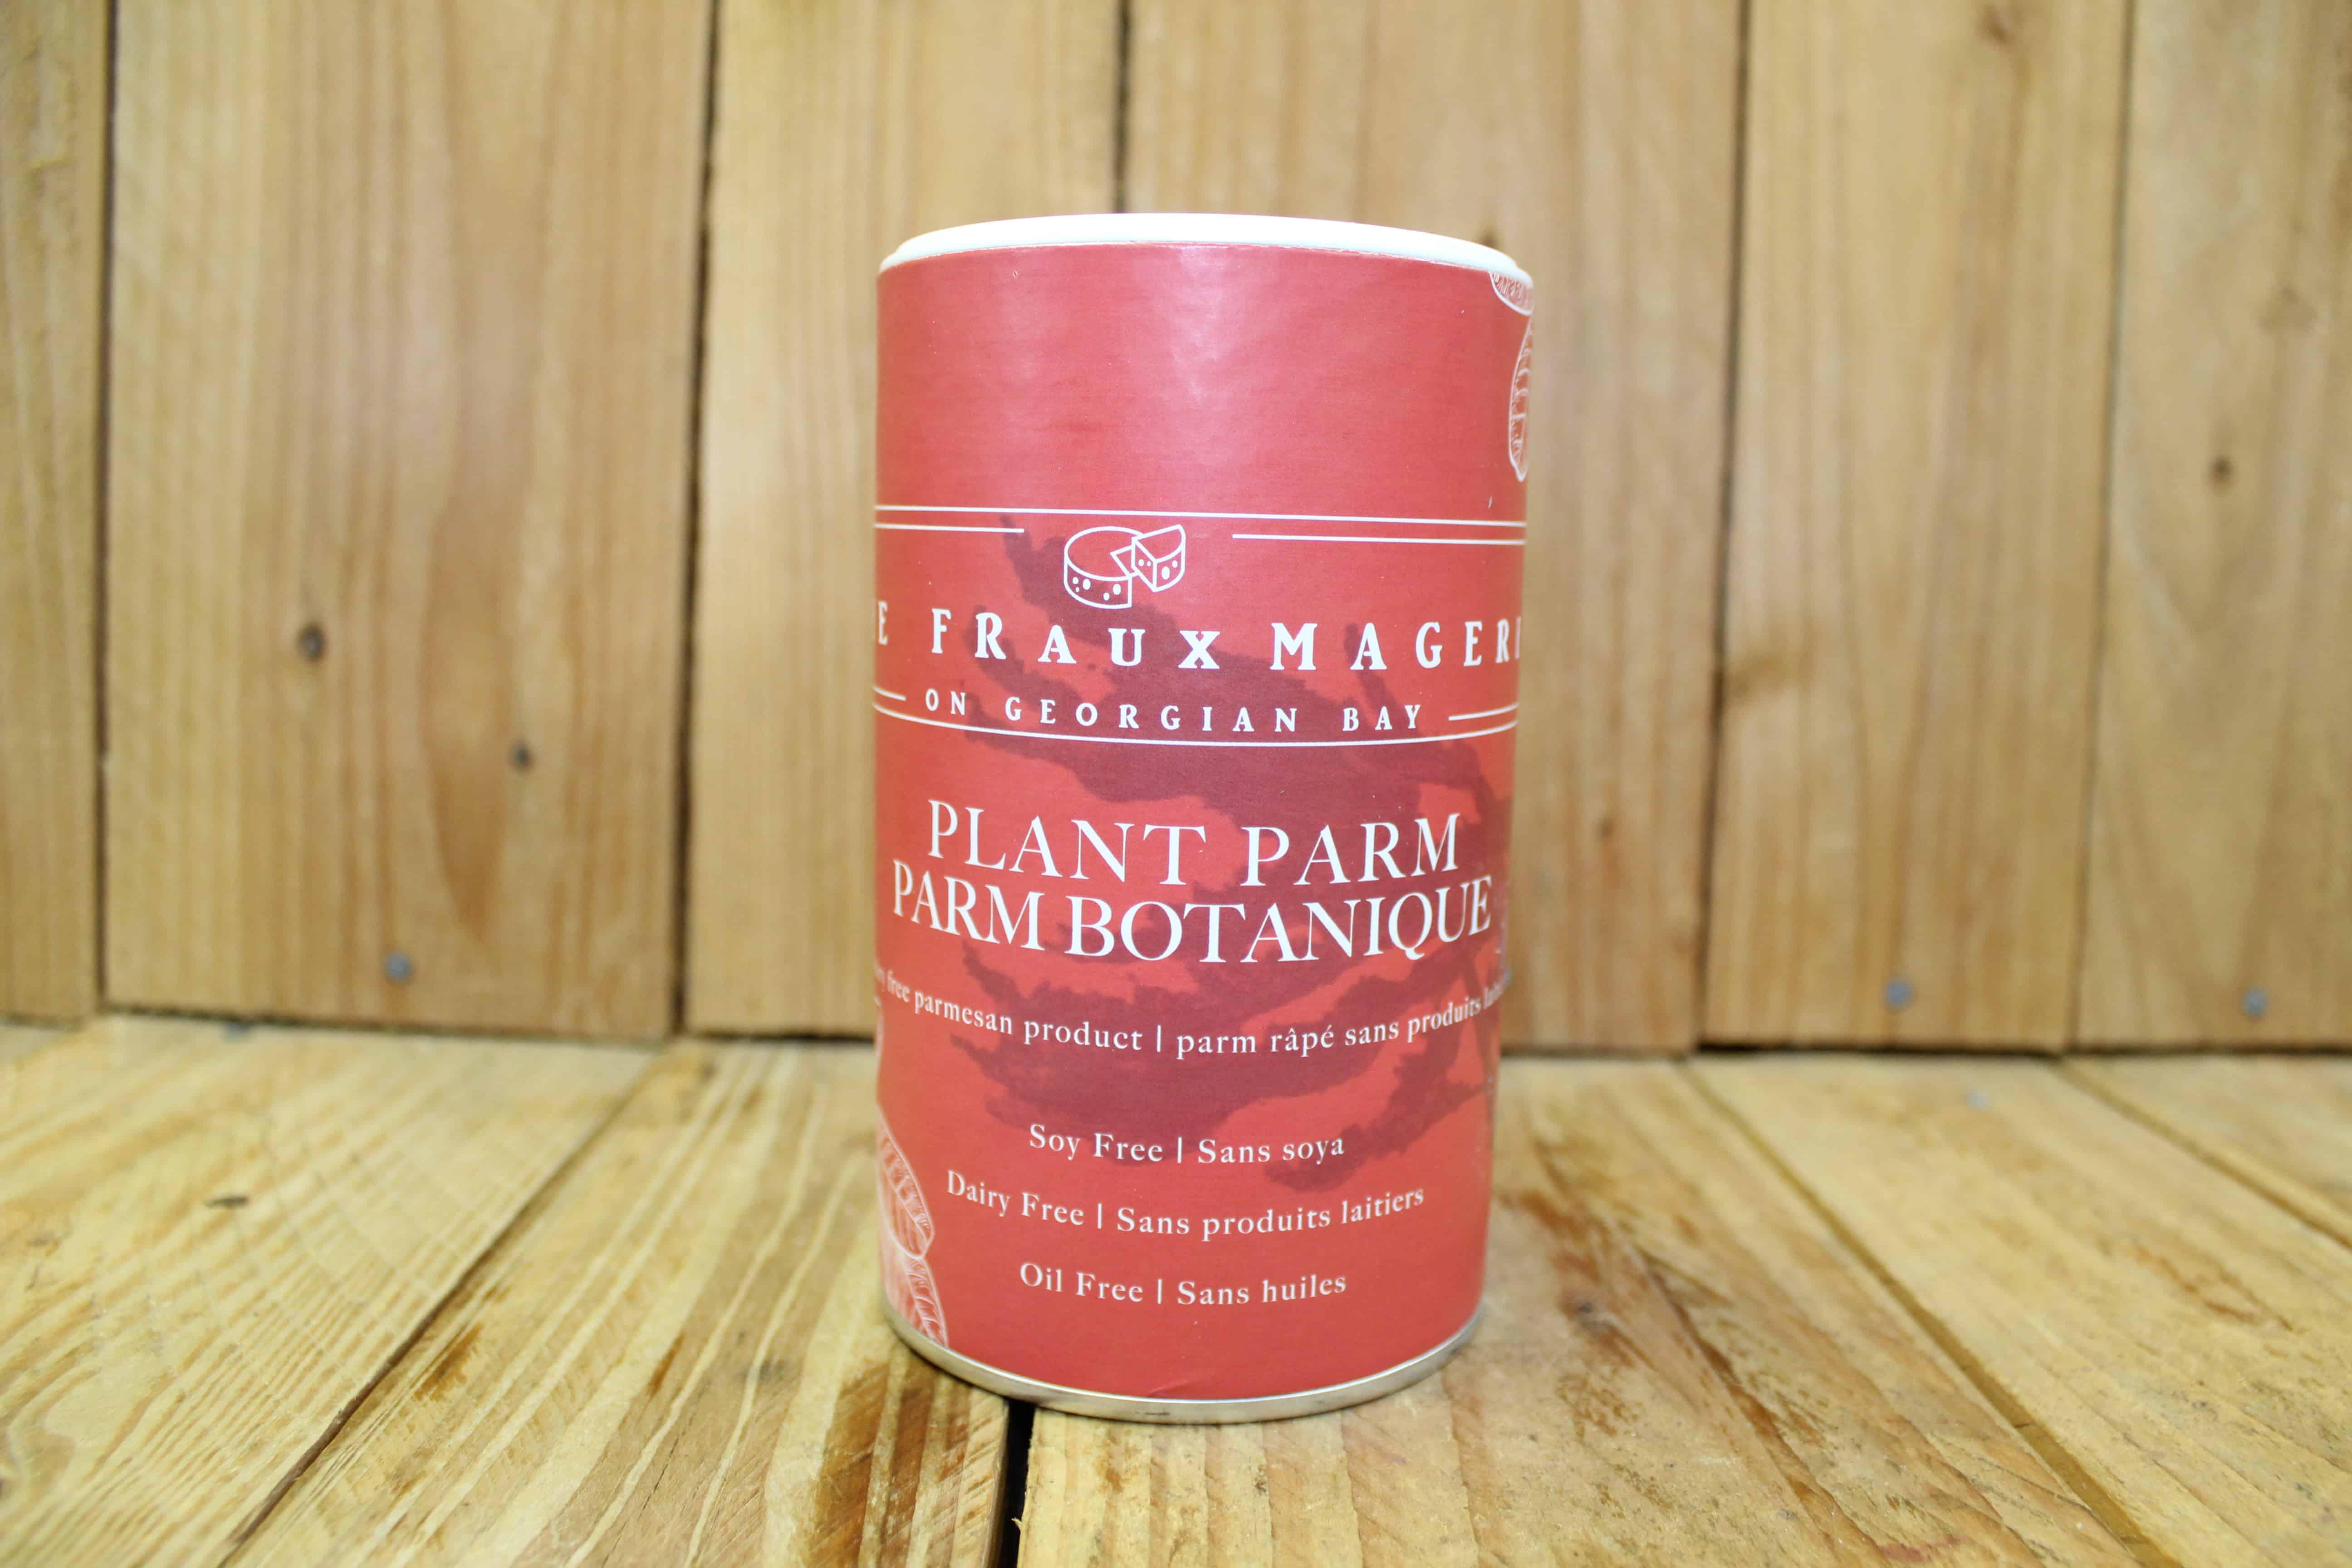 Frauxmagerie Georgian Bay – Plant-Based Parm VEGAN (165g)